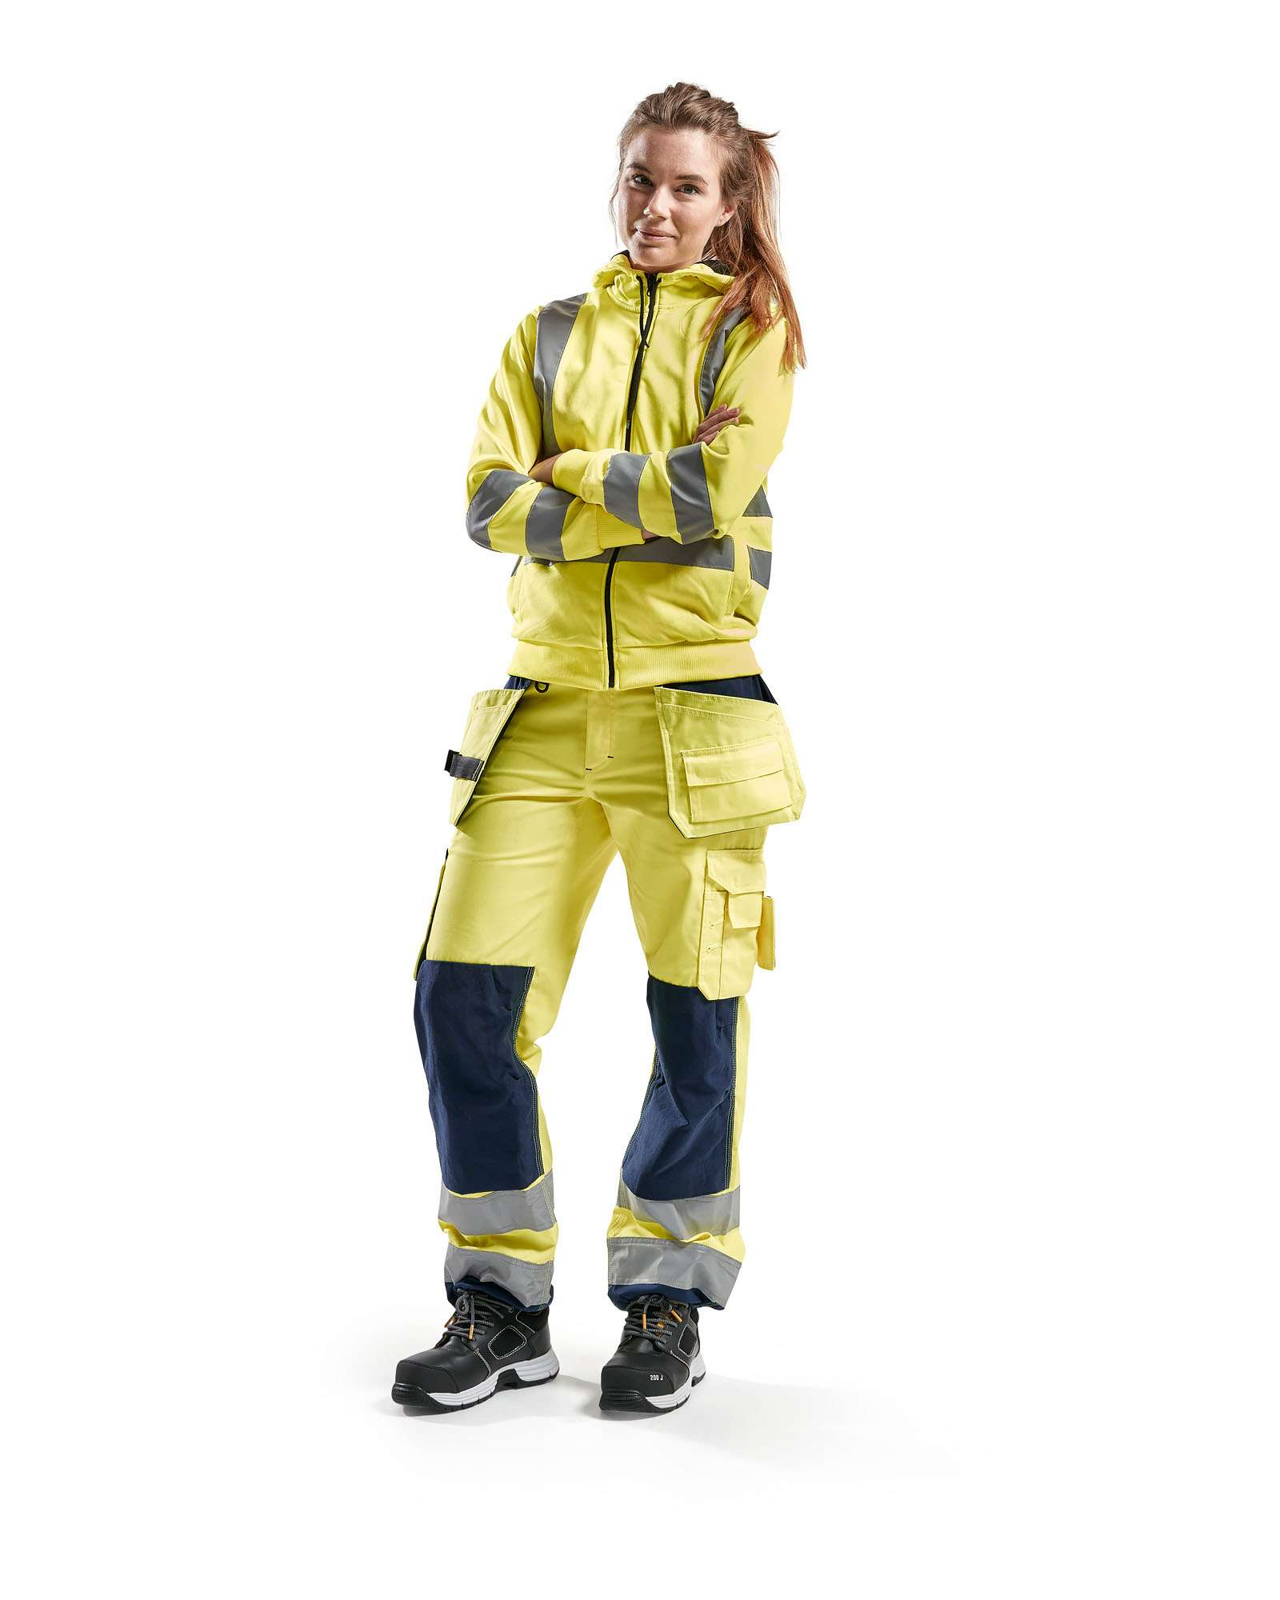 Blaklader Dames werkbroeken 71561811 High Vis geel-marineblauw(3389)